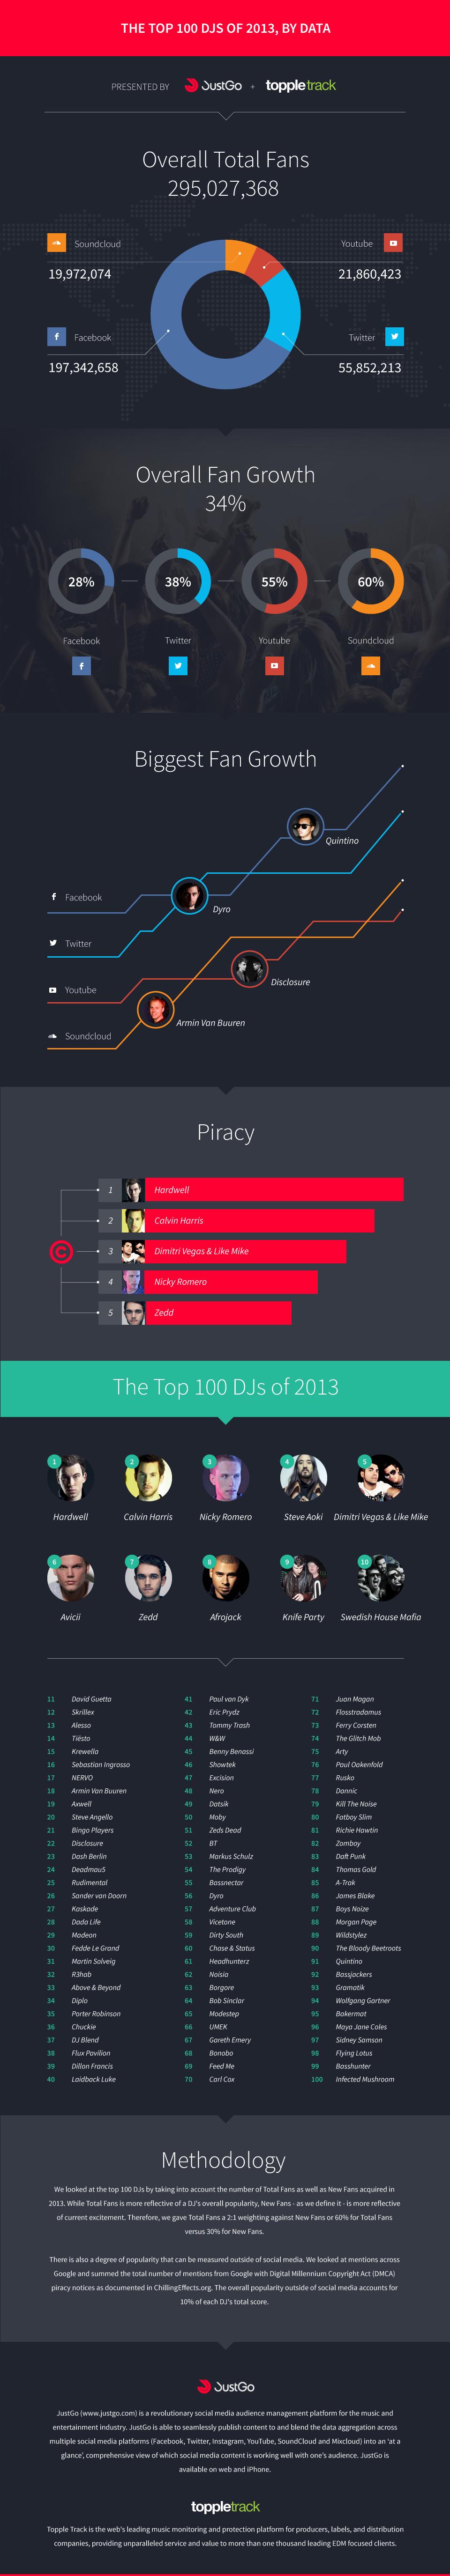 2013-Top100DJs-JustGo-YourEDM